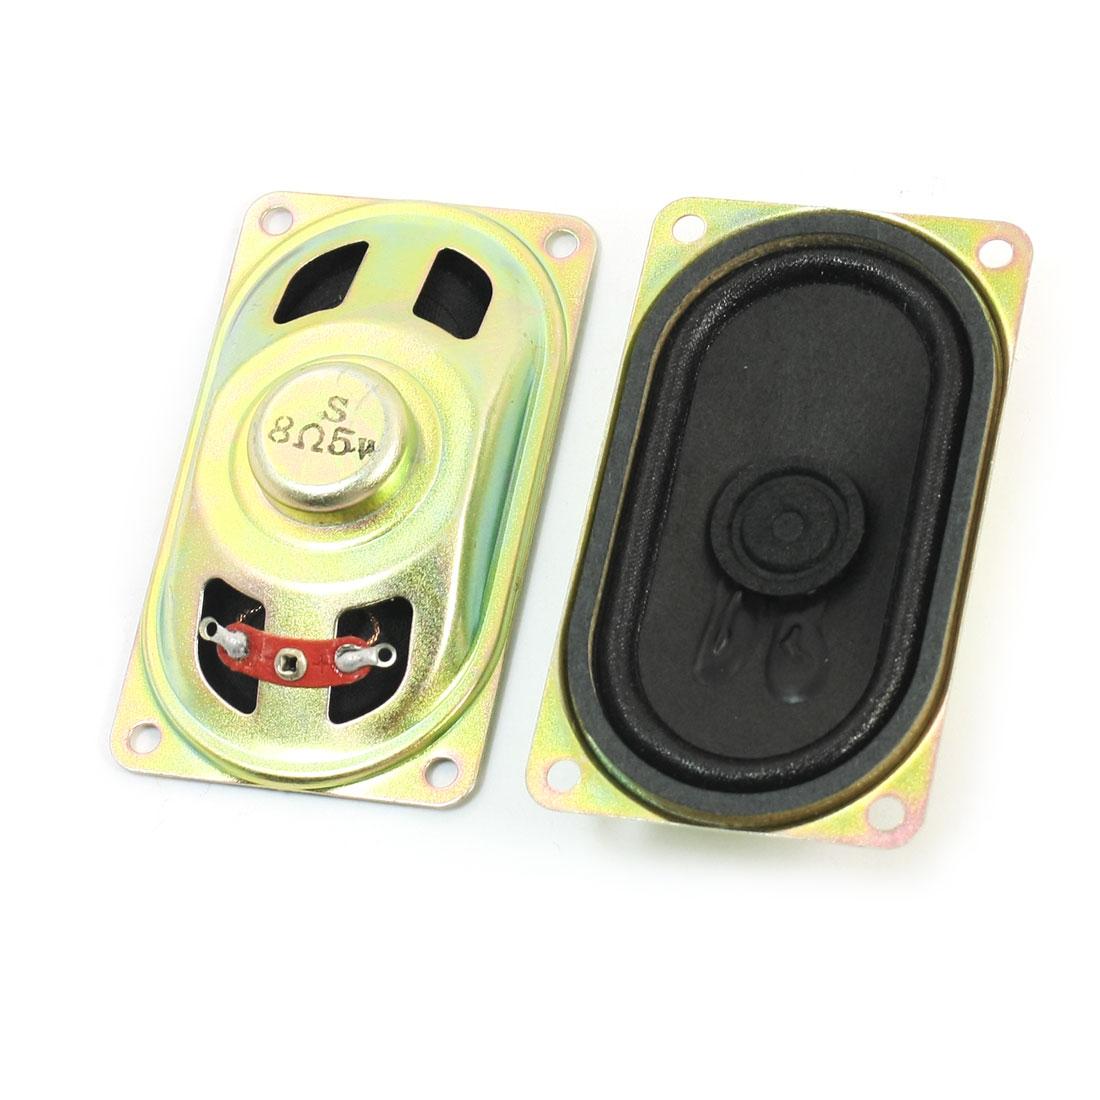 2 Pcs 70mm x 40mm LCD TV Audio Magnetic Type Speaker Loudspeaker 5W 8 Ohm